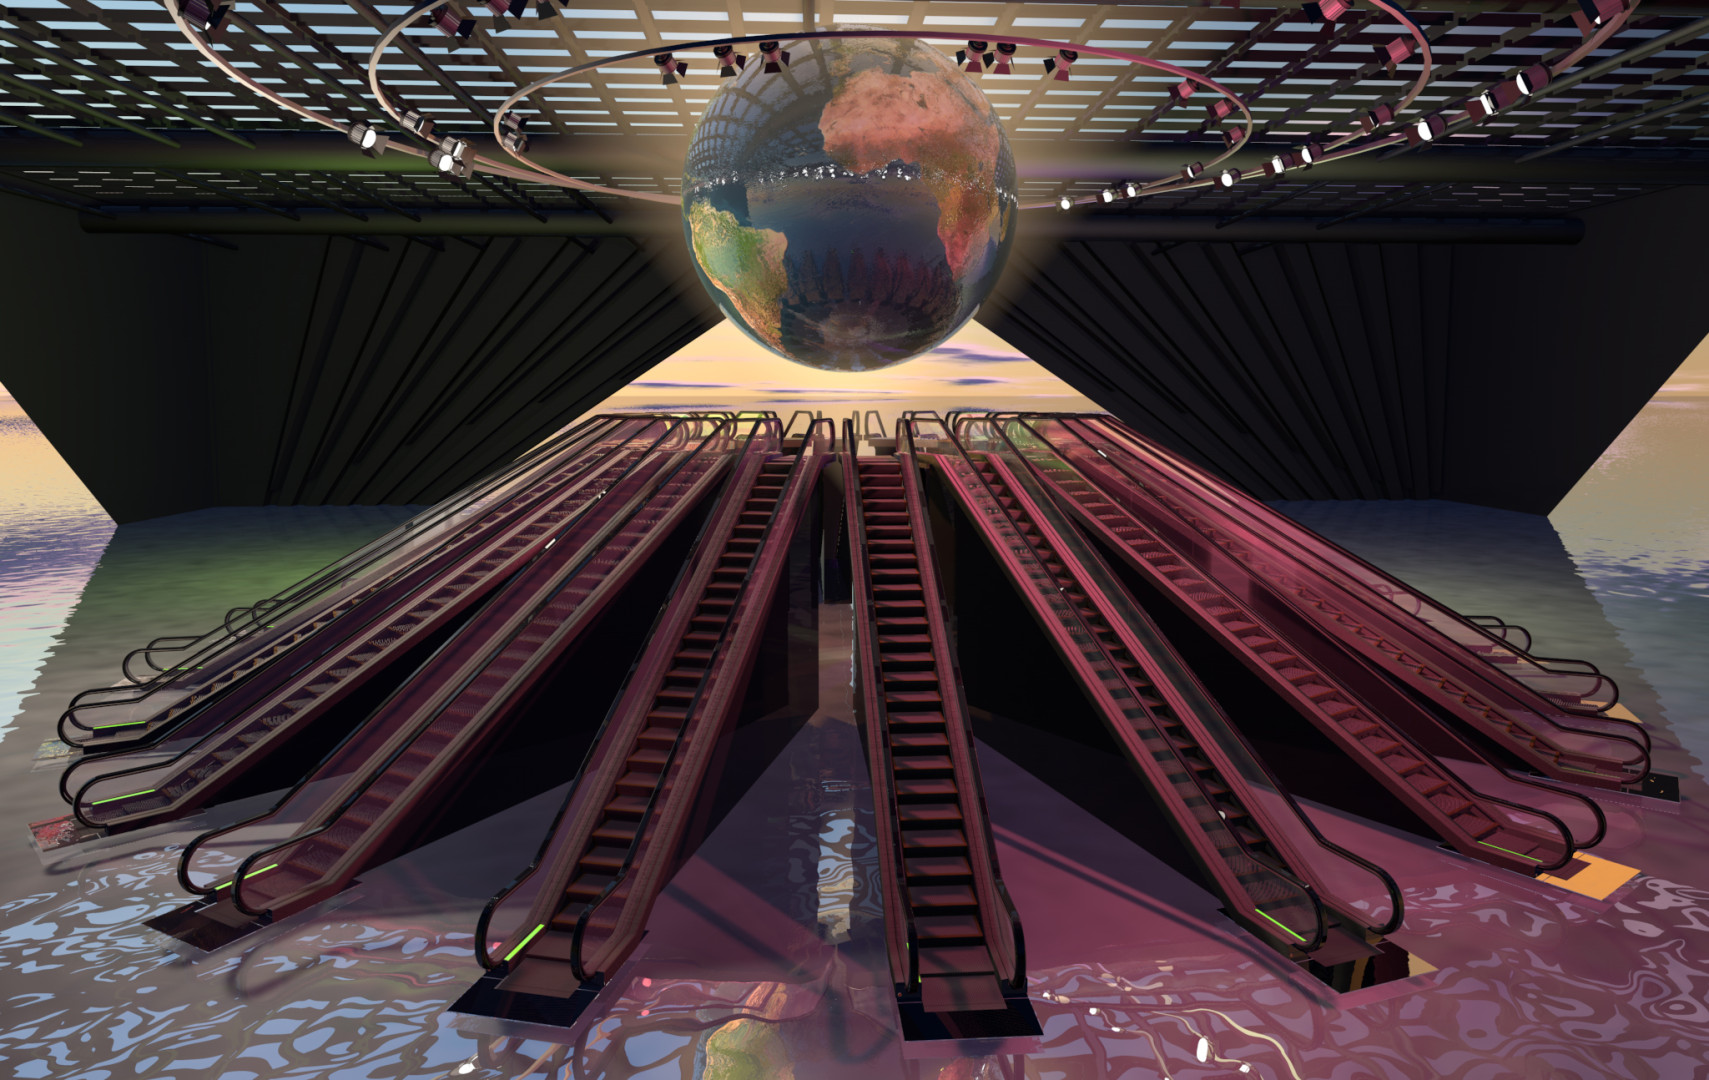 Scene 12 - Stairways To Heaven